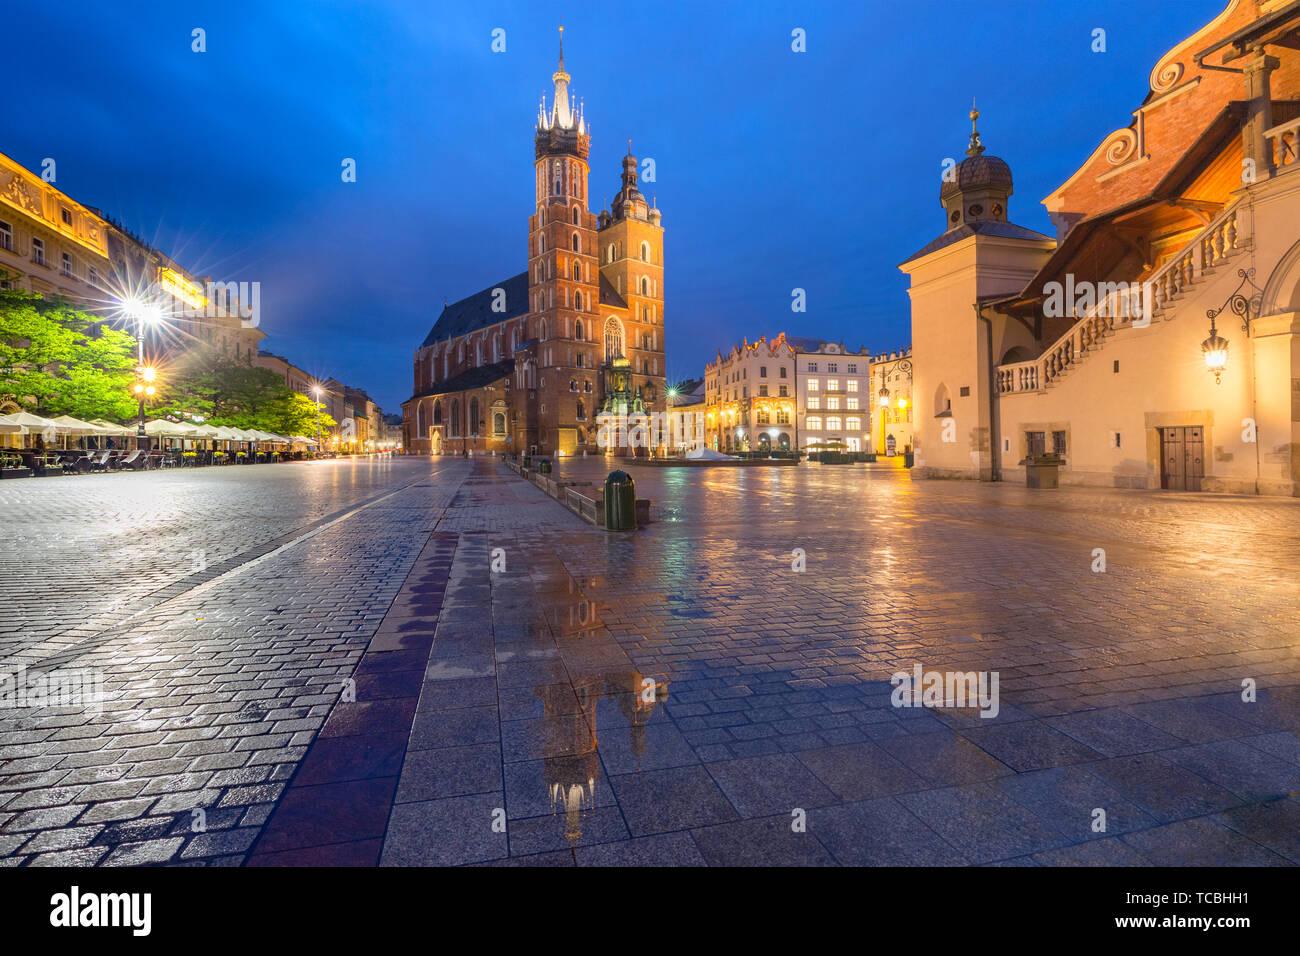 Plaza del Mercado de Cracovia, Polonia Foto de stock